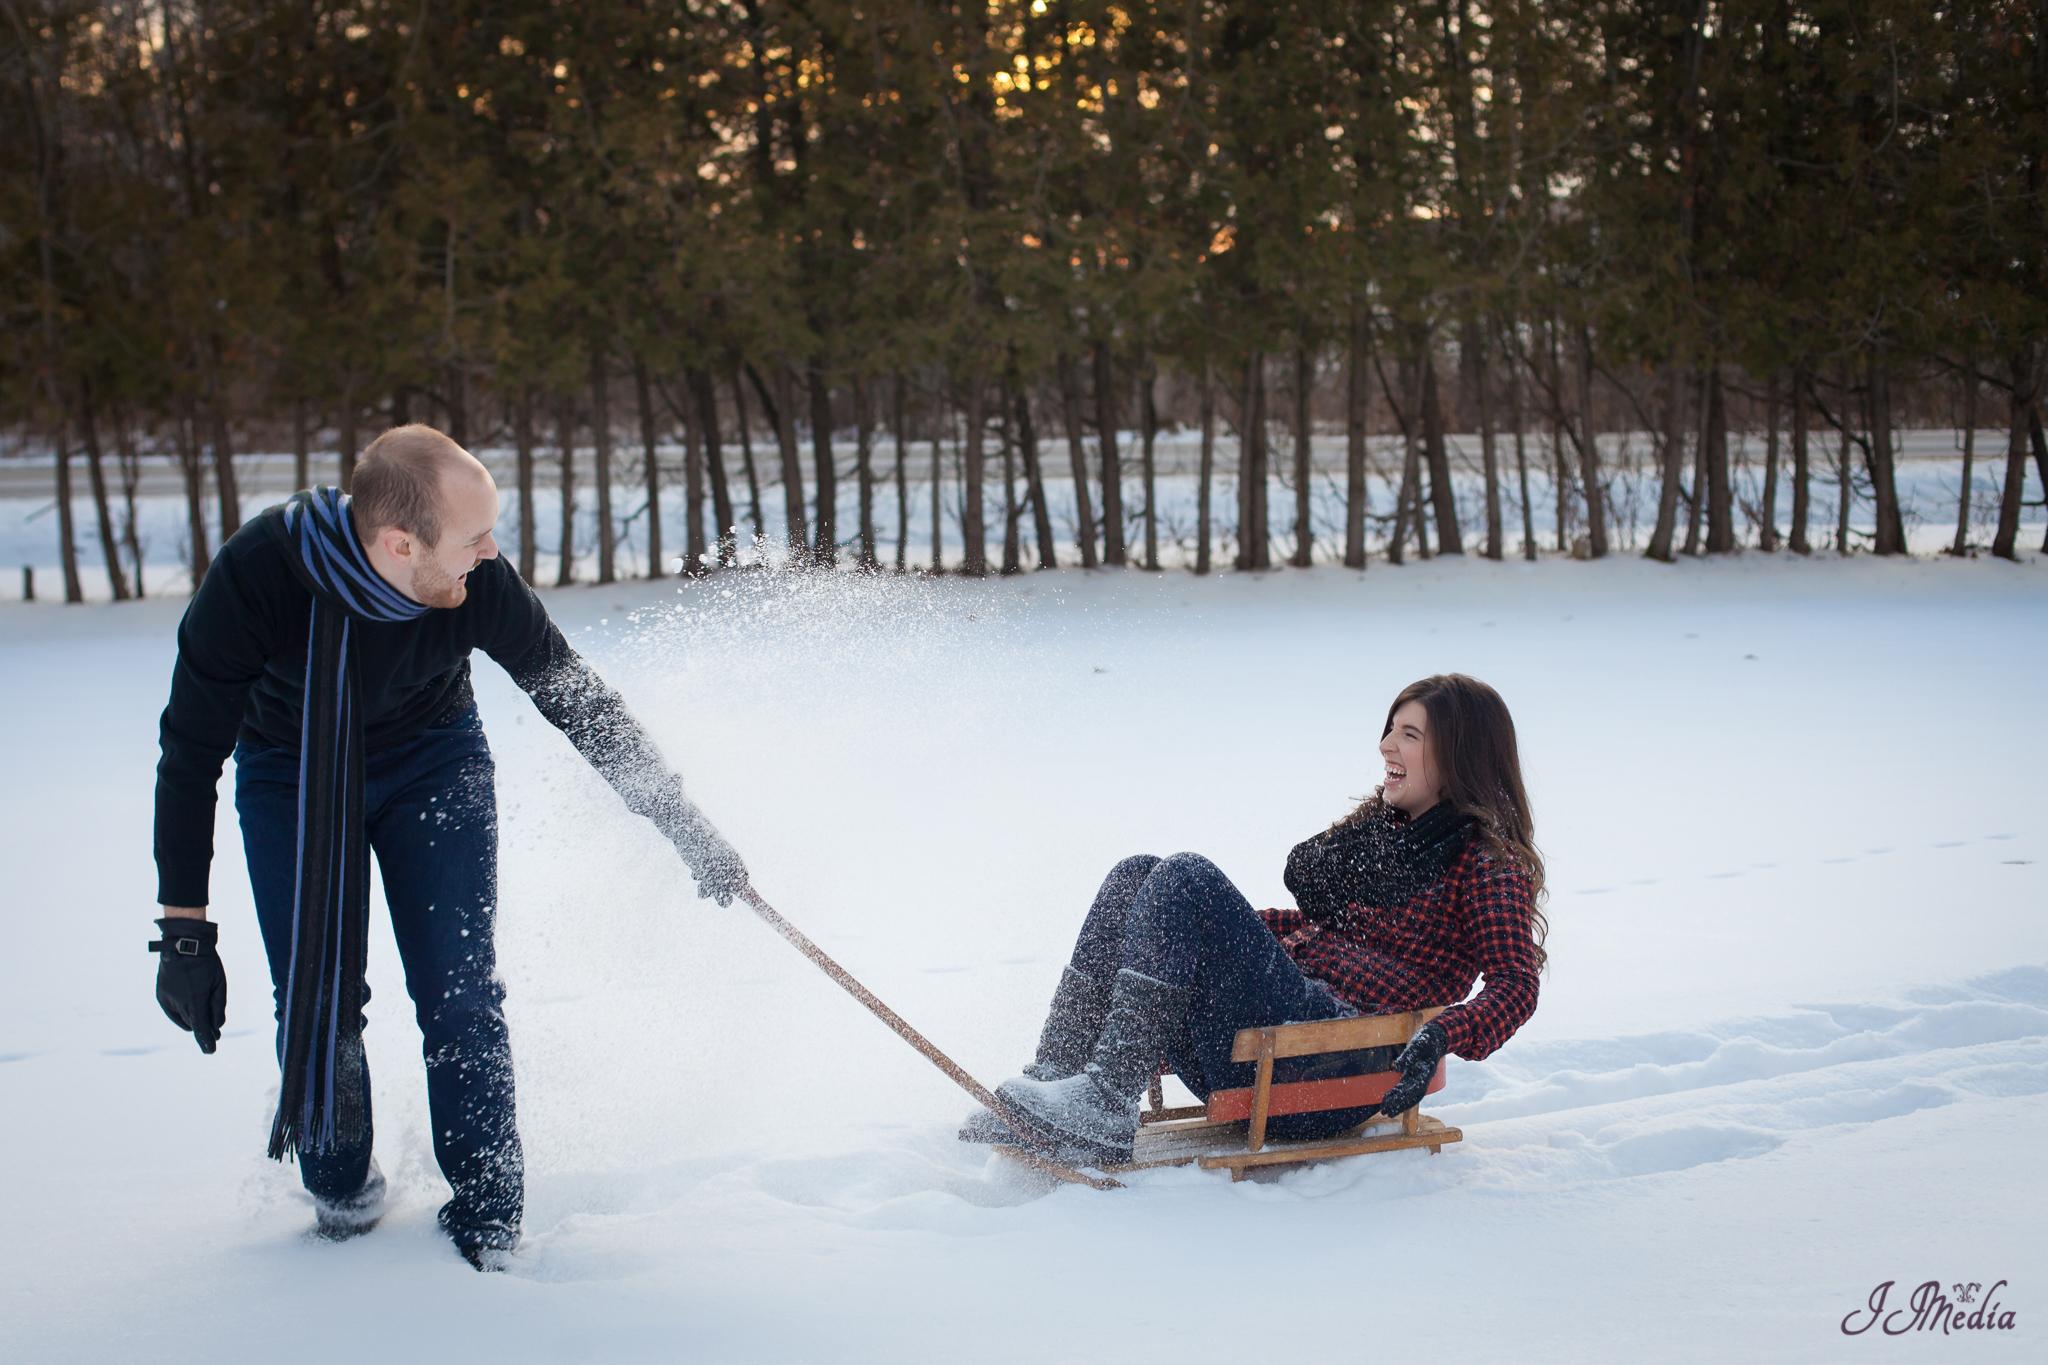 Winter-Engagement-Photos-JJMedia-35